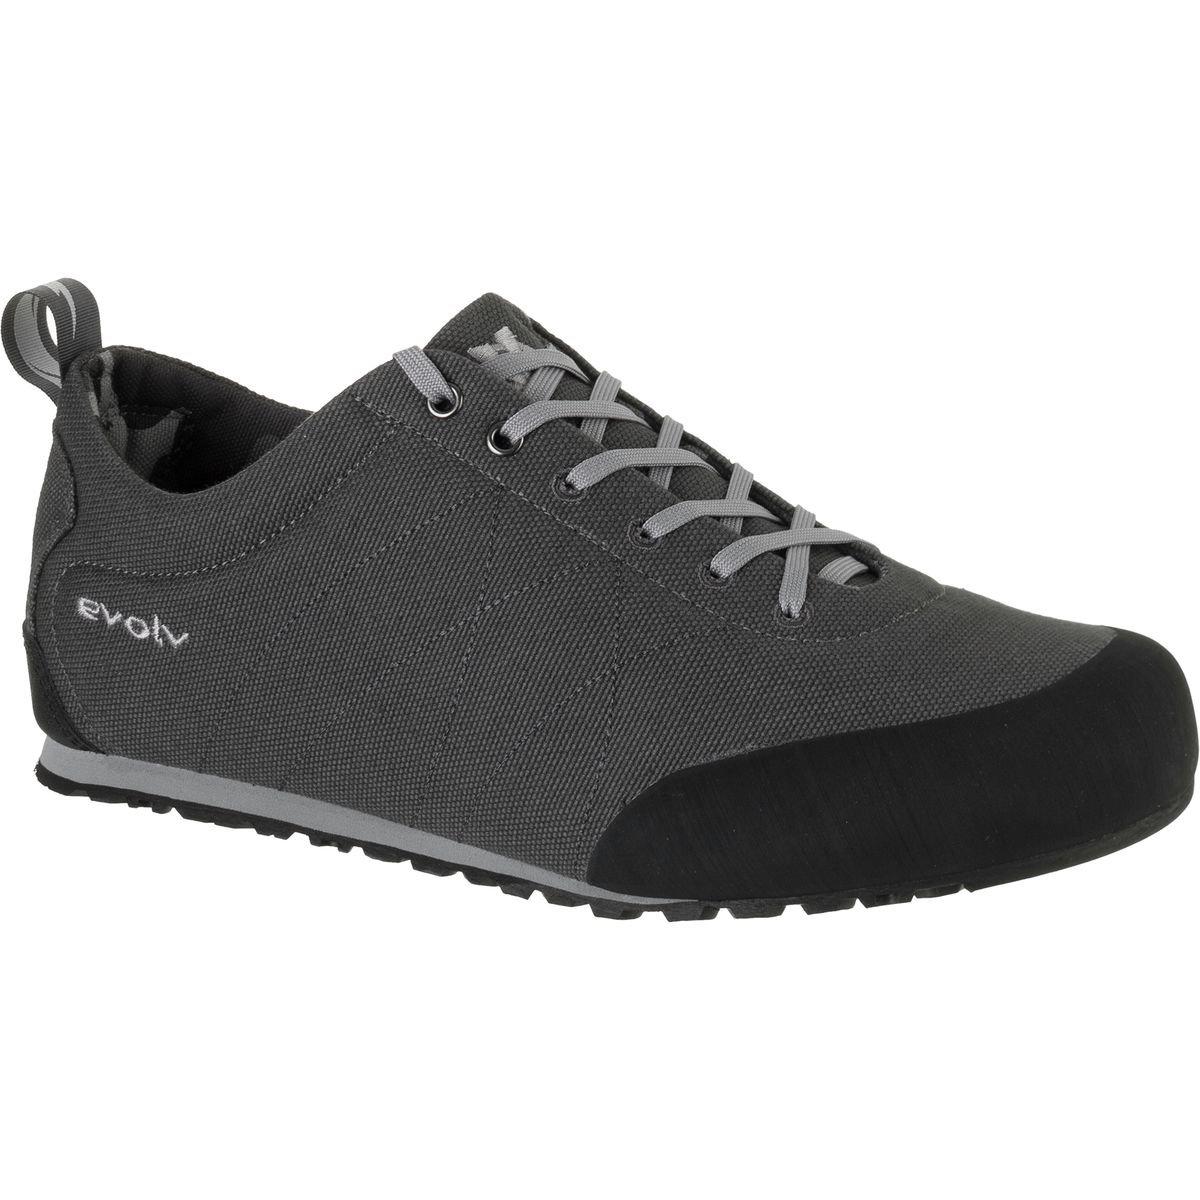 Evolv Cruzer Psyche Approach Shoe B01LZHTDG7 8.5 D(M) US|Camo Gray